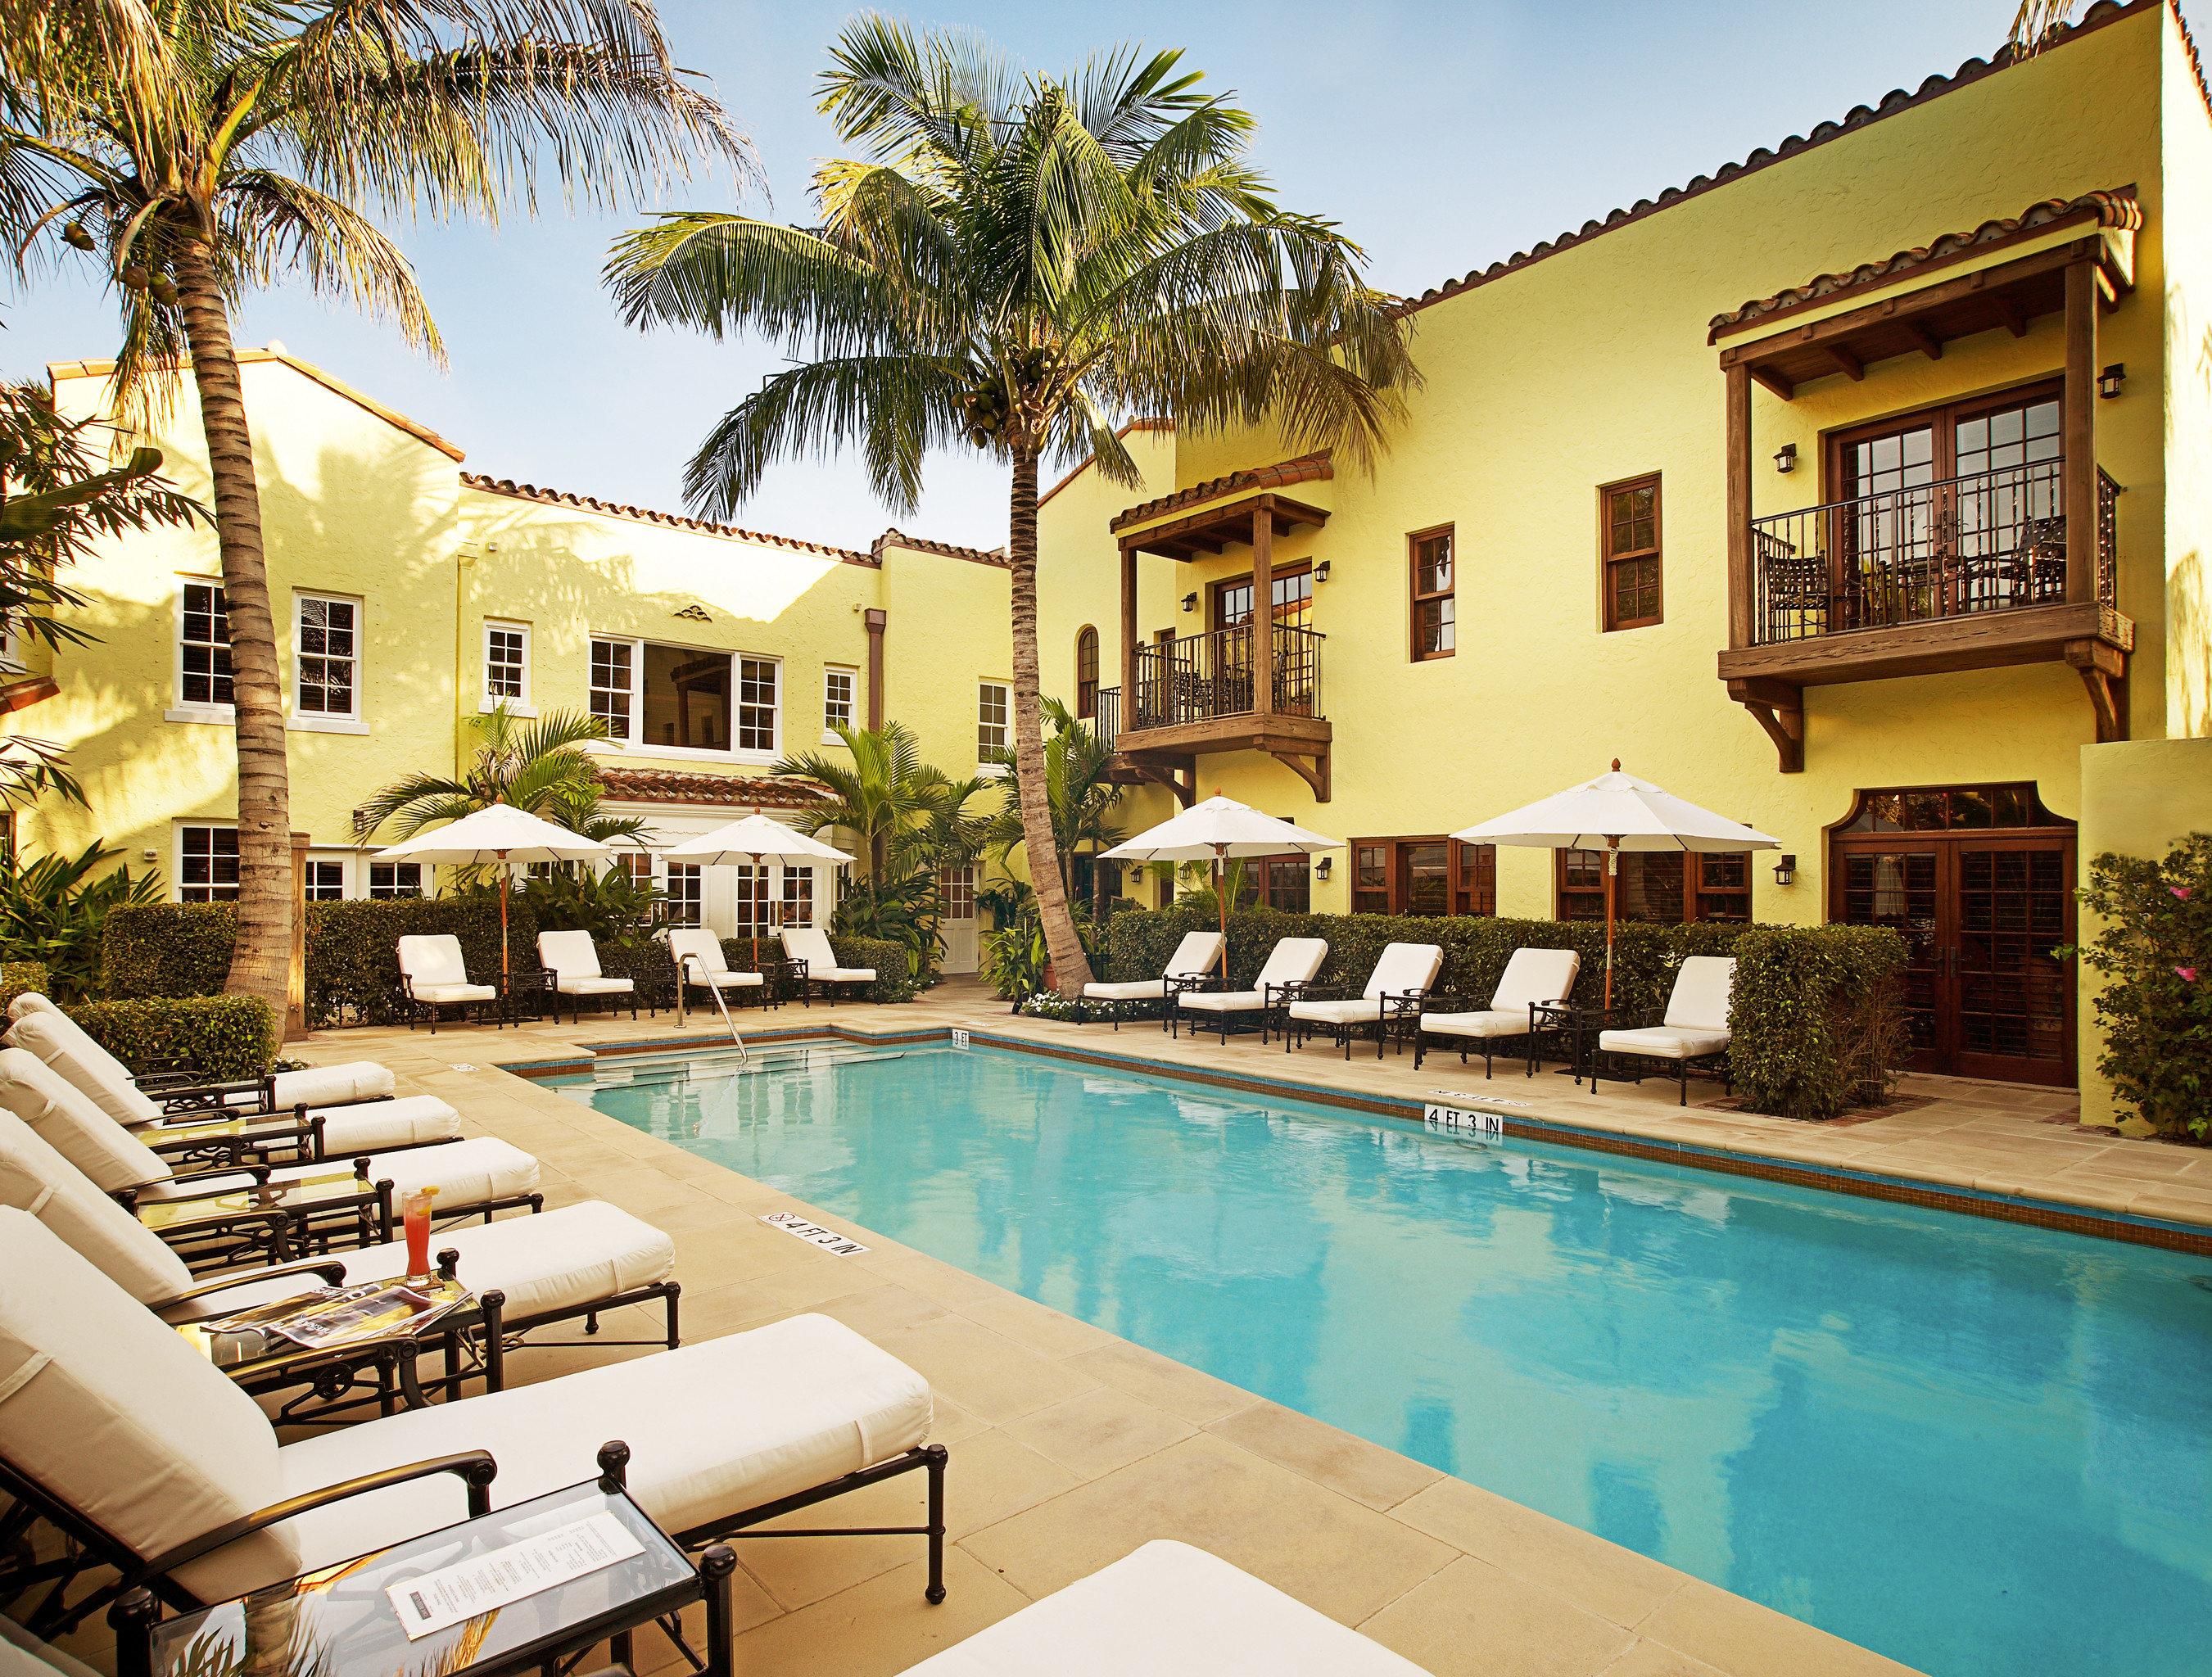 building tree property condominium swimming pool leisure Resort Villa house home mansion hacienda palace